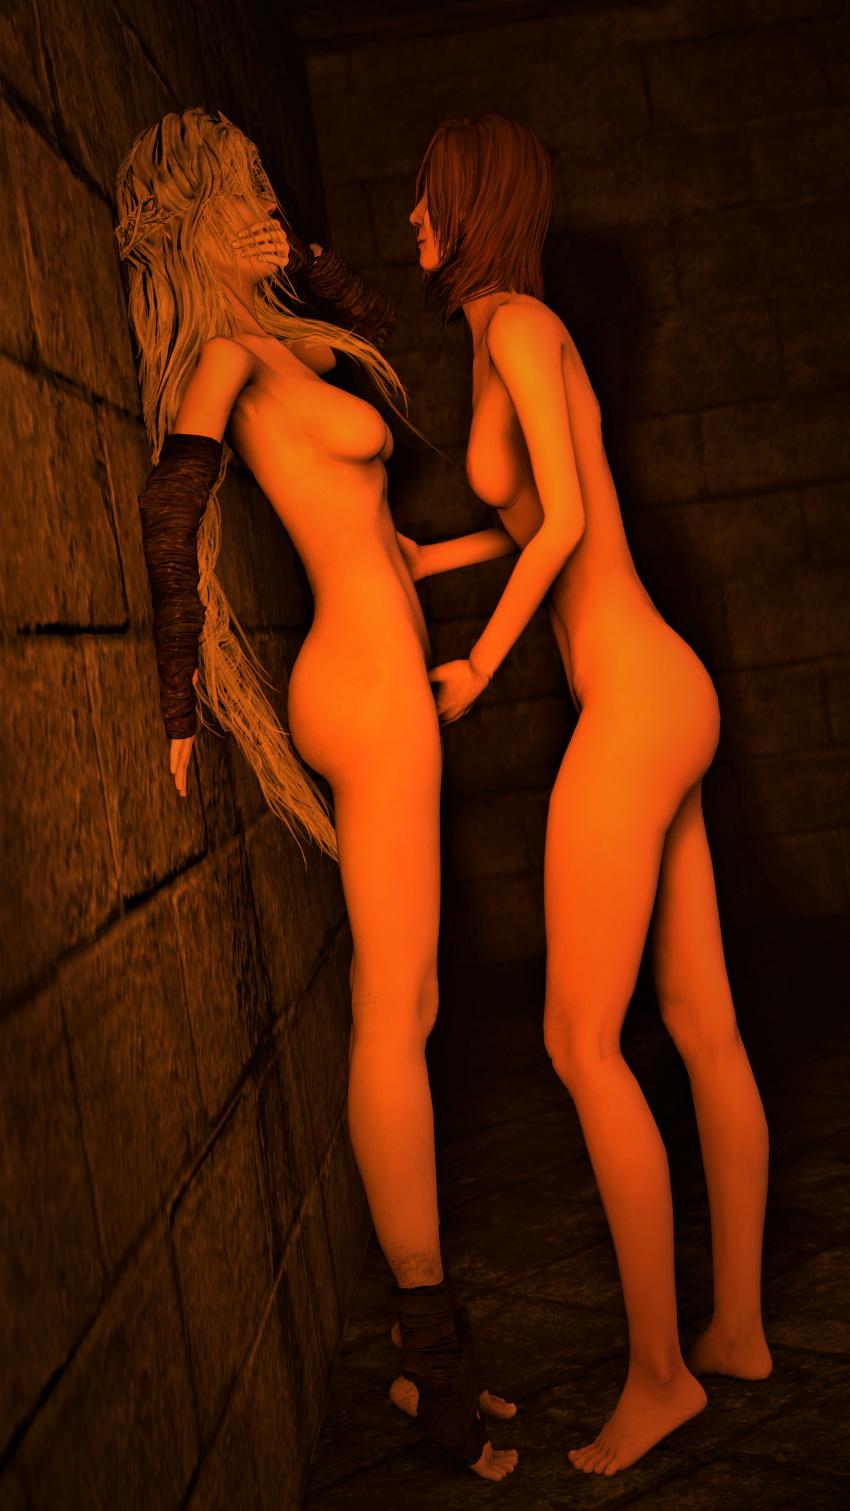 souls pyromancer desert dark 2 set Rip van winkle hellsing